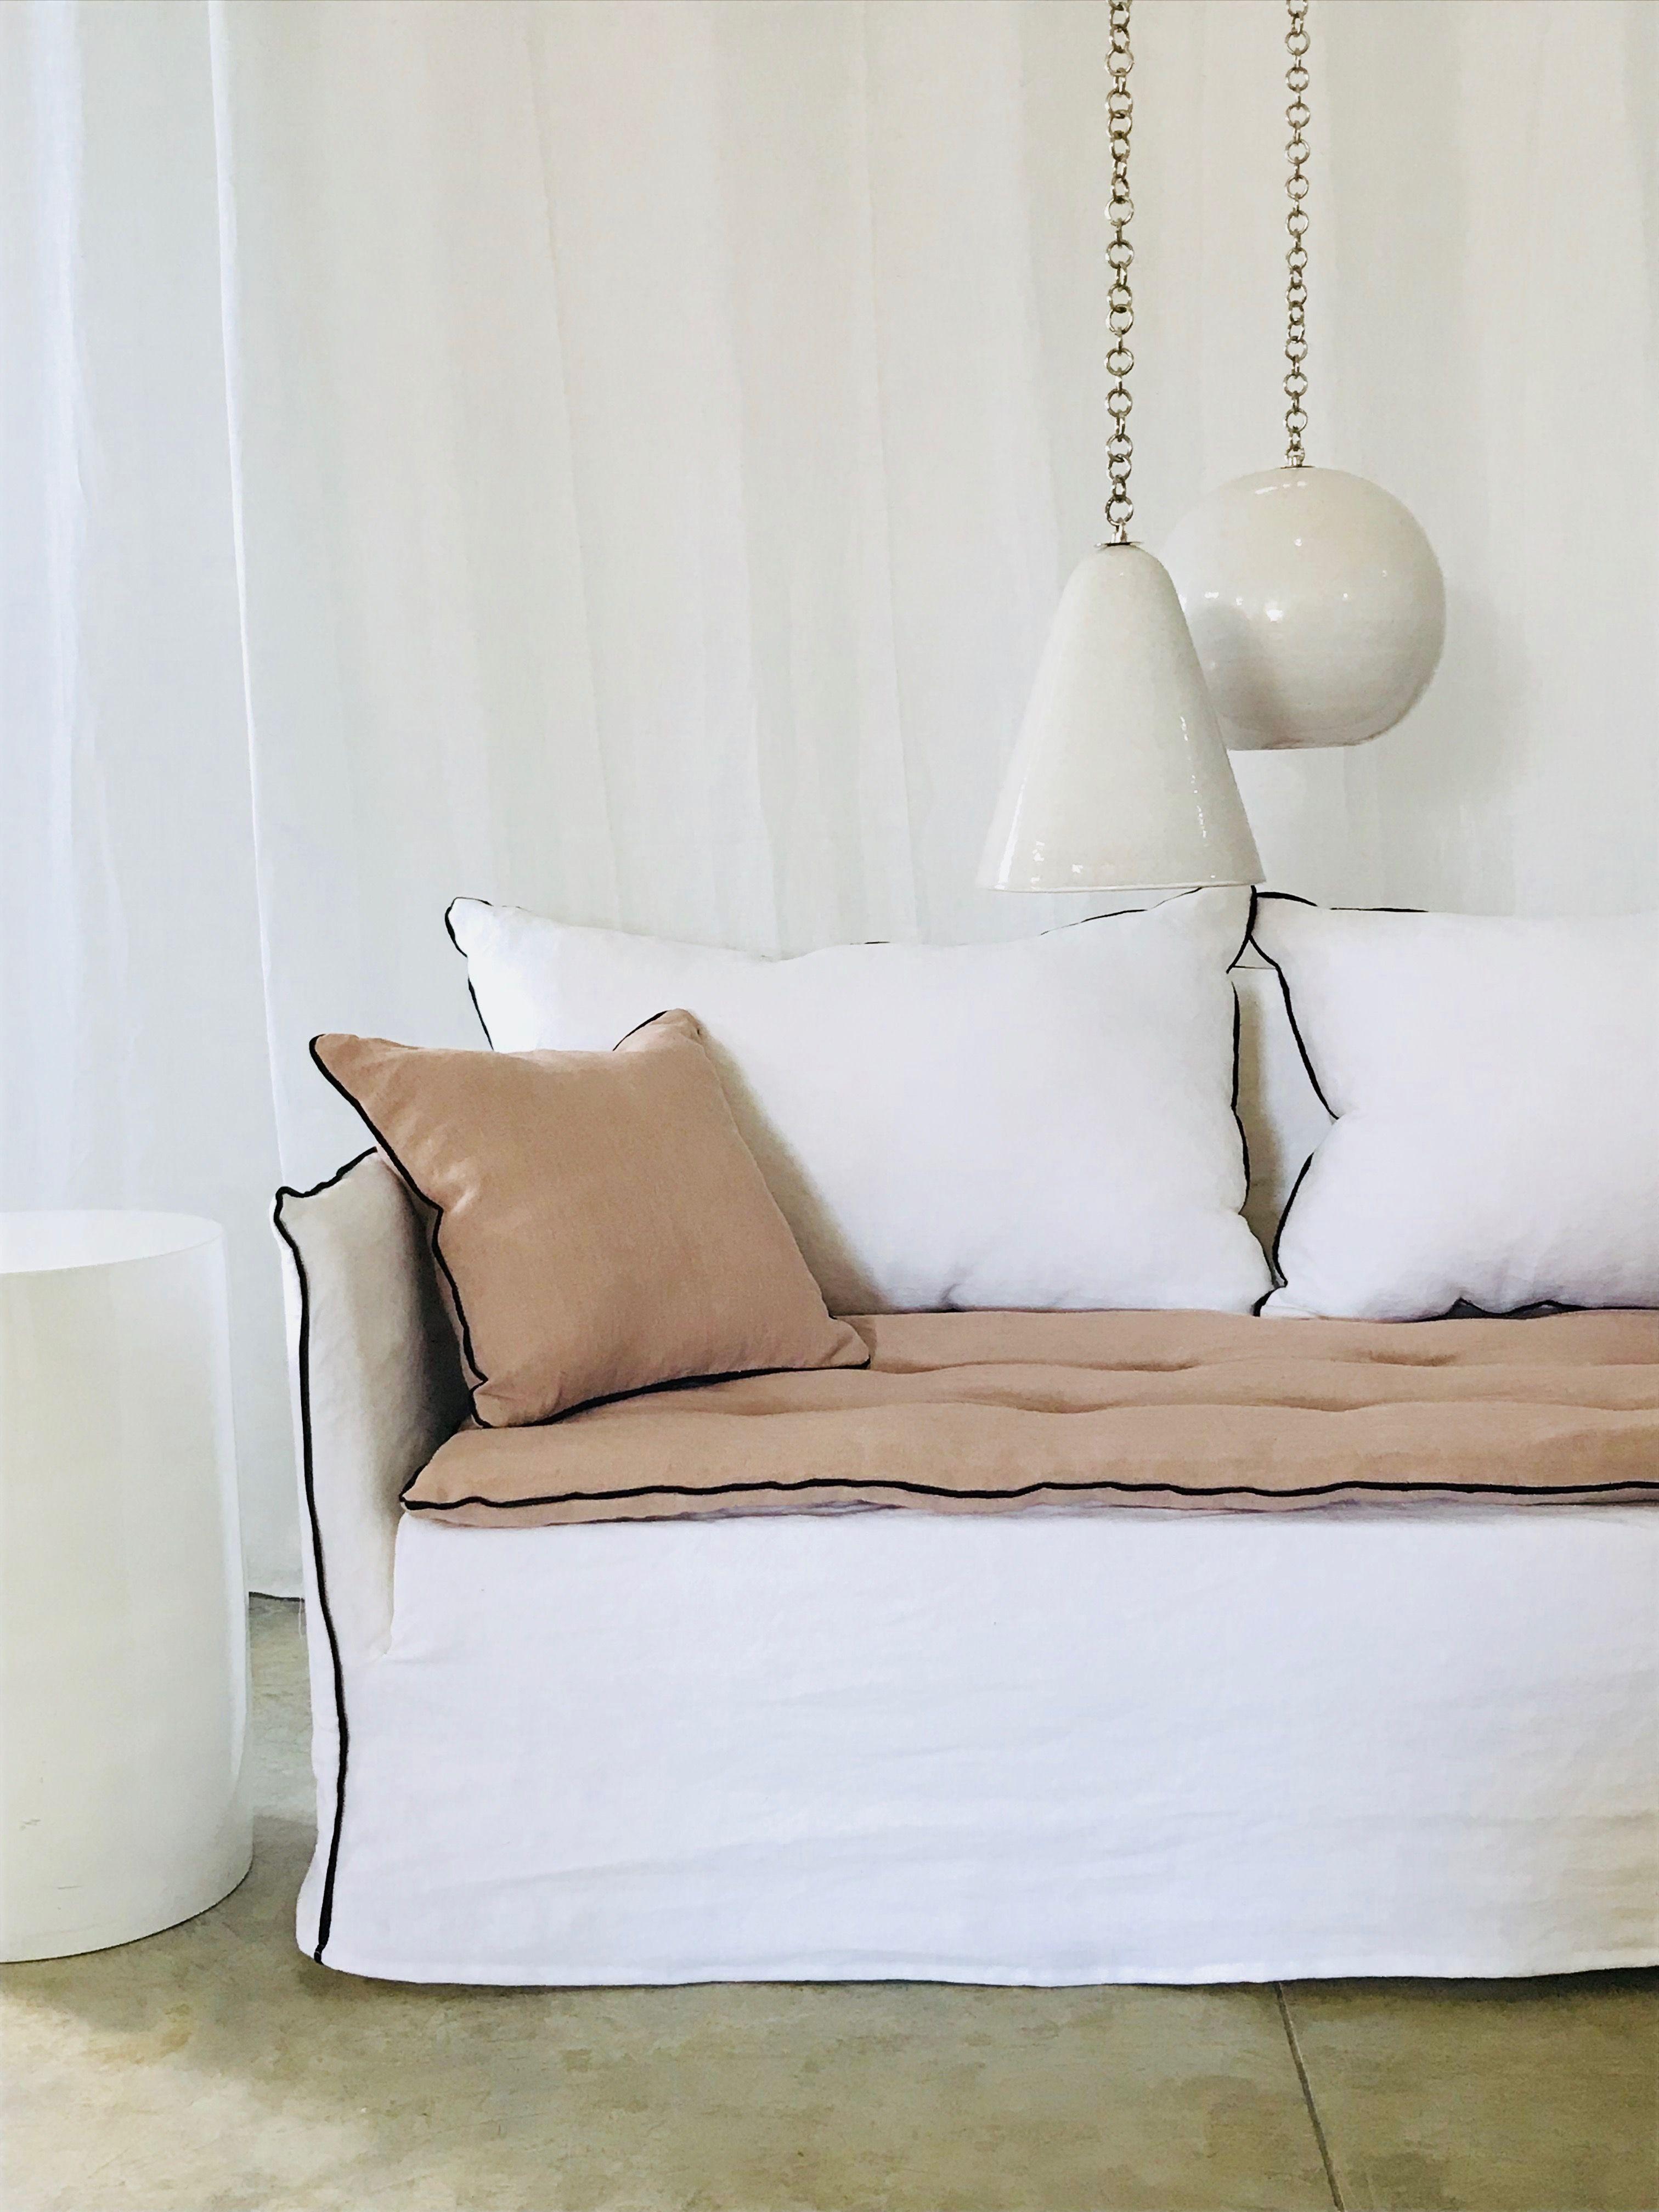 Canape Sur Mesure Lin Lave Blanc Avec Sofa Cover Lin Lave Rose The Meuble Canape Petit Canape Canape